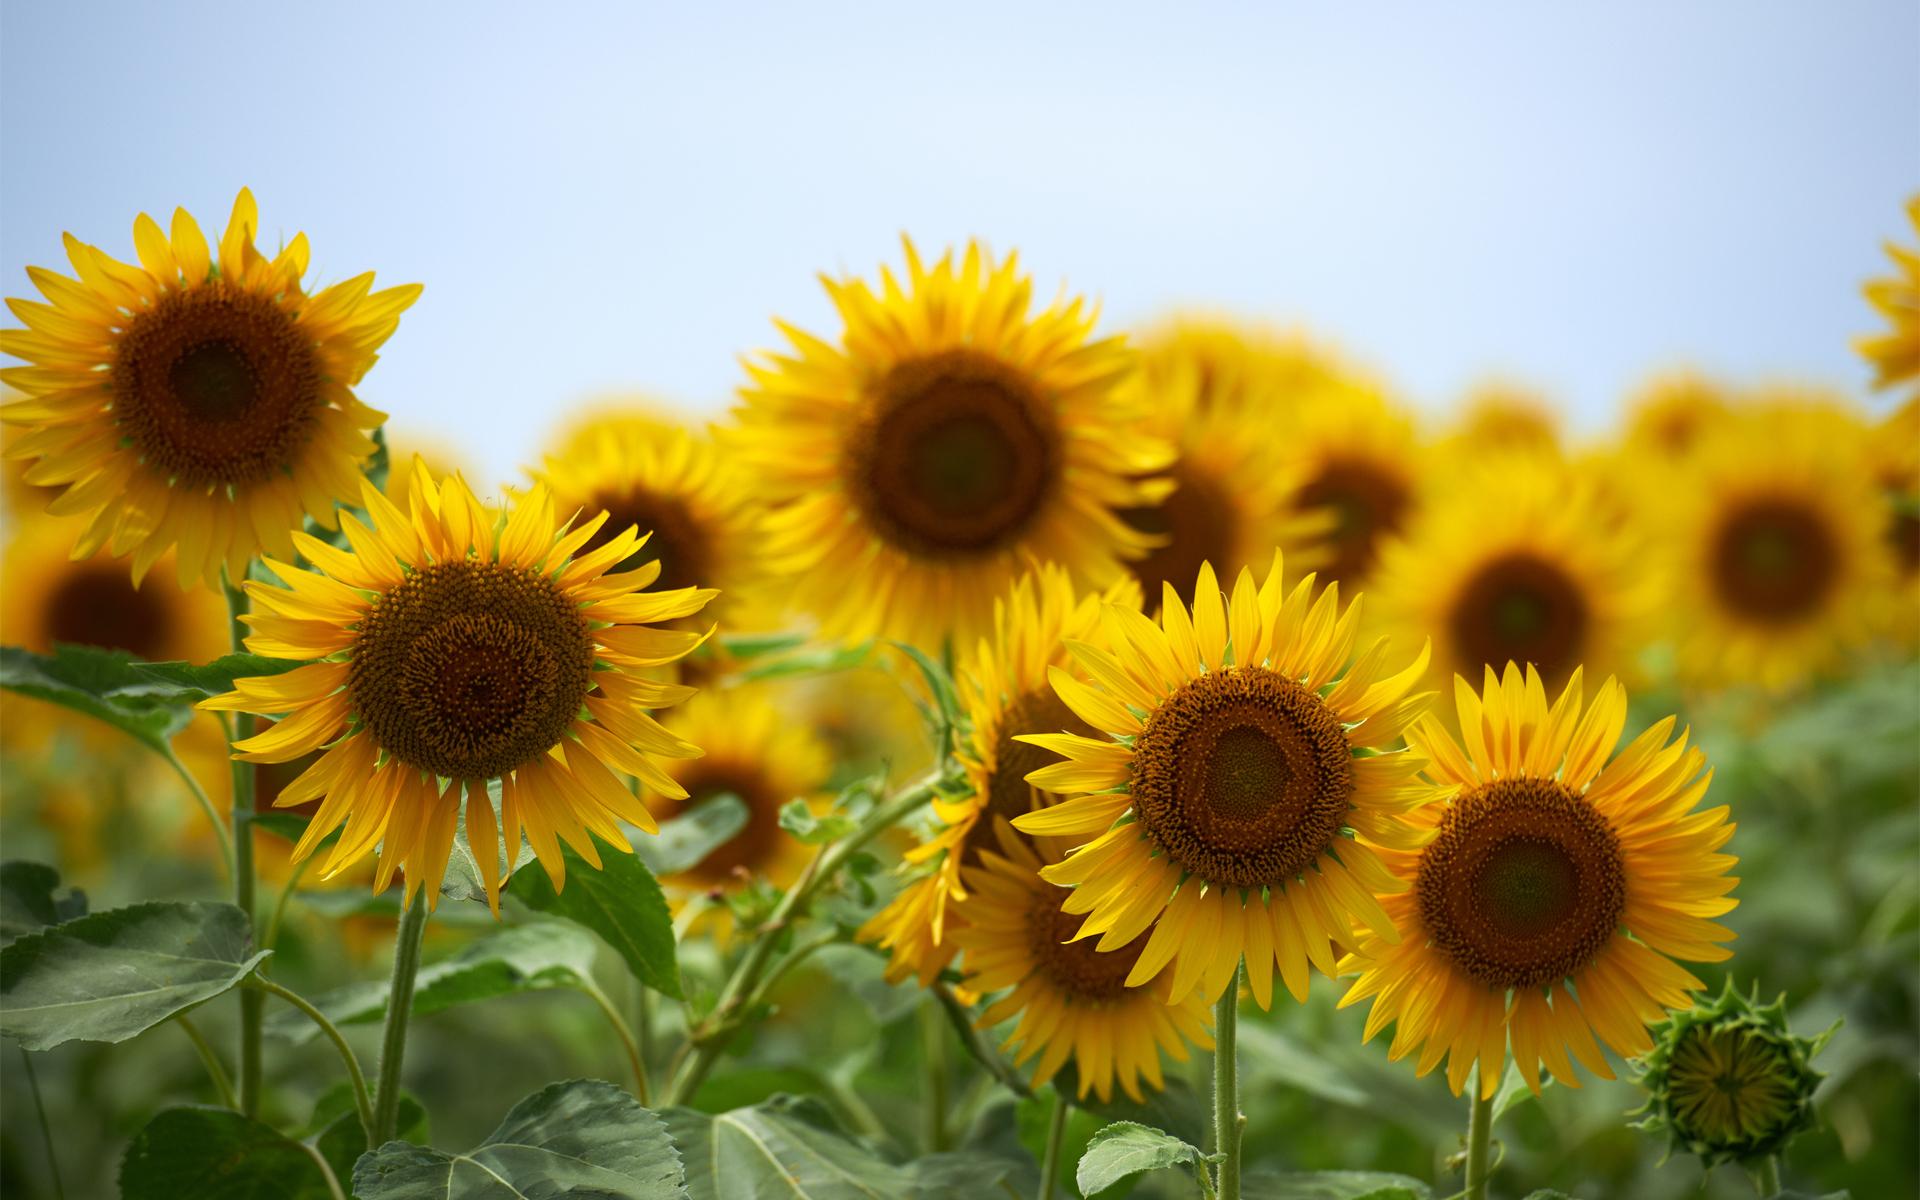 Flores Horizontales Dibujos Animados Patrón De Fondo: Sunflower HD Wallpaper